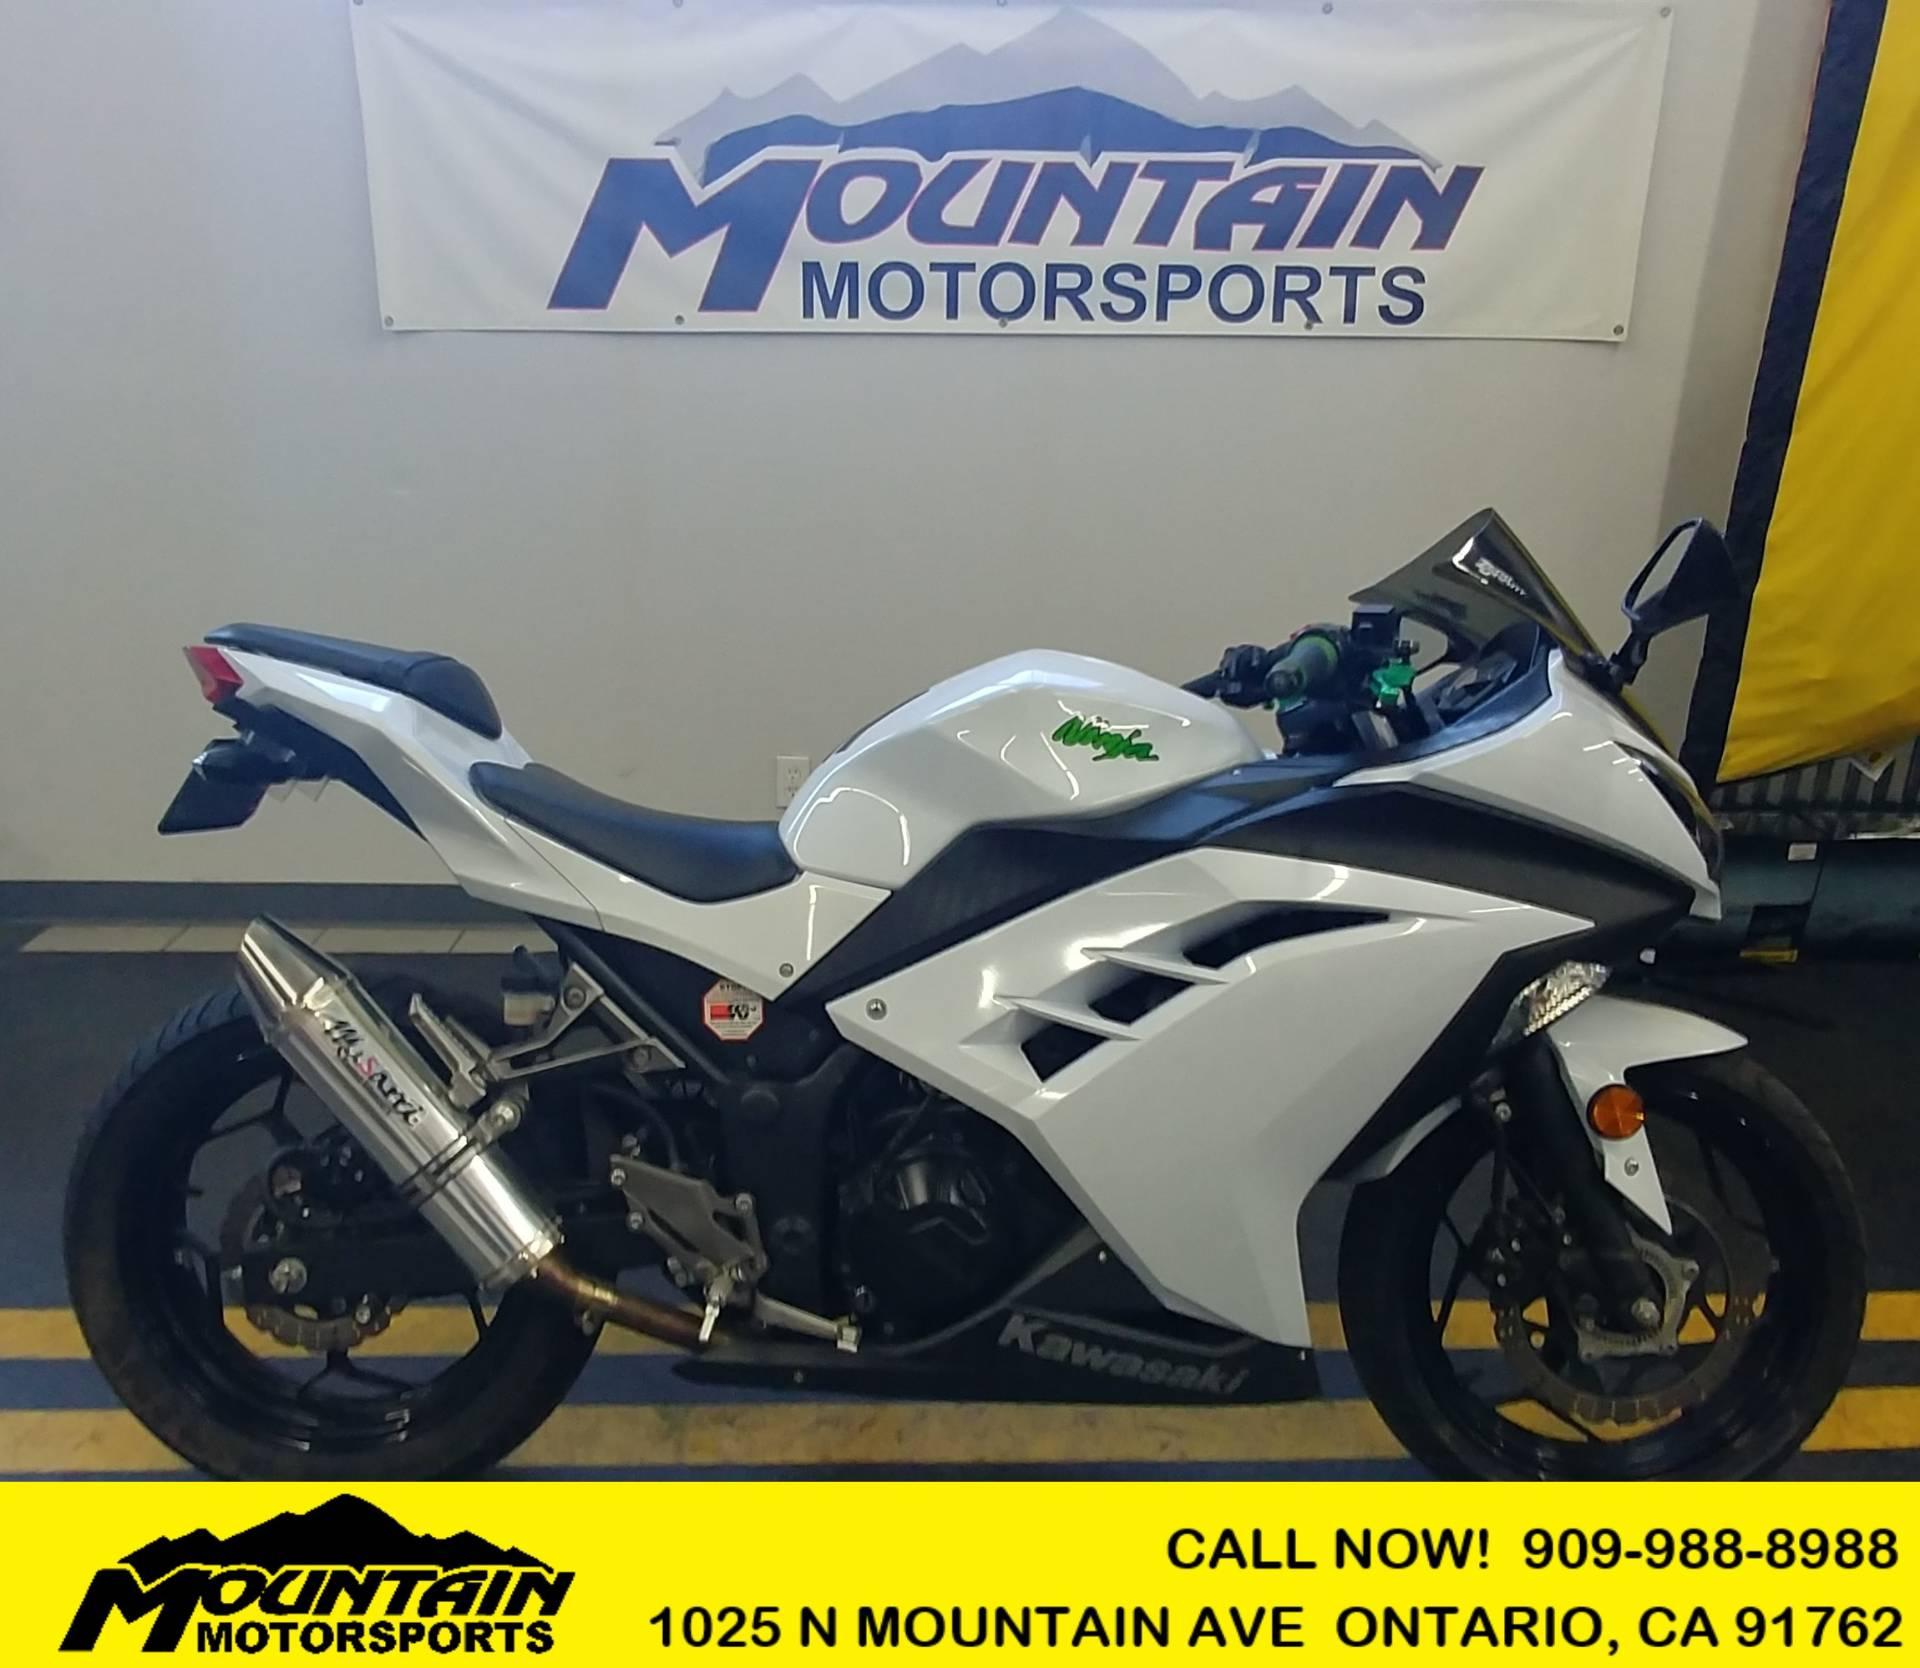 Used 2015 Kawasaki Ninja 300 Abs Motorcycles In Ontario Ca